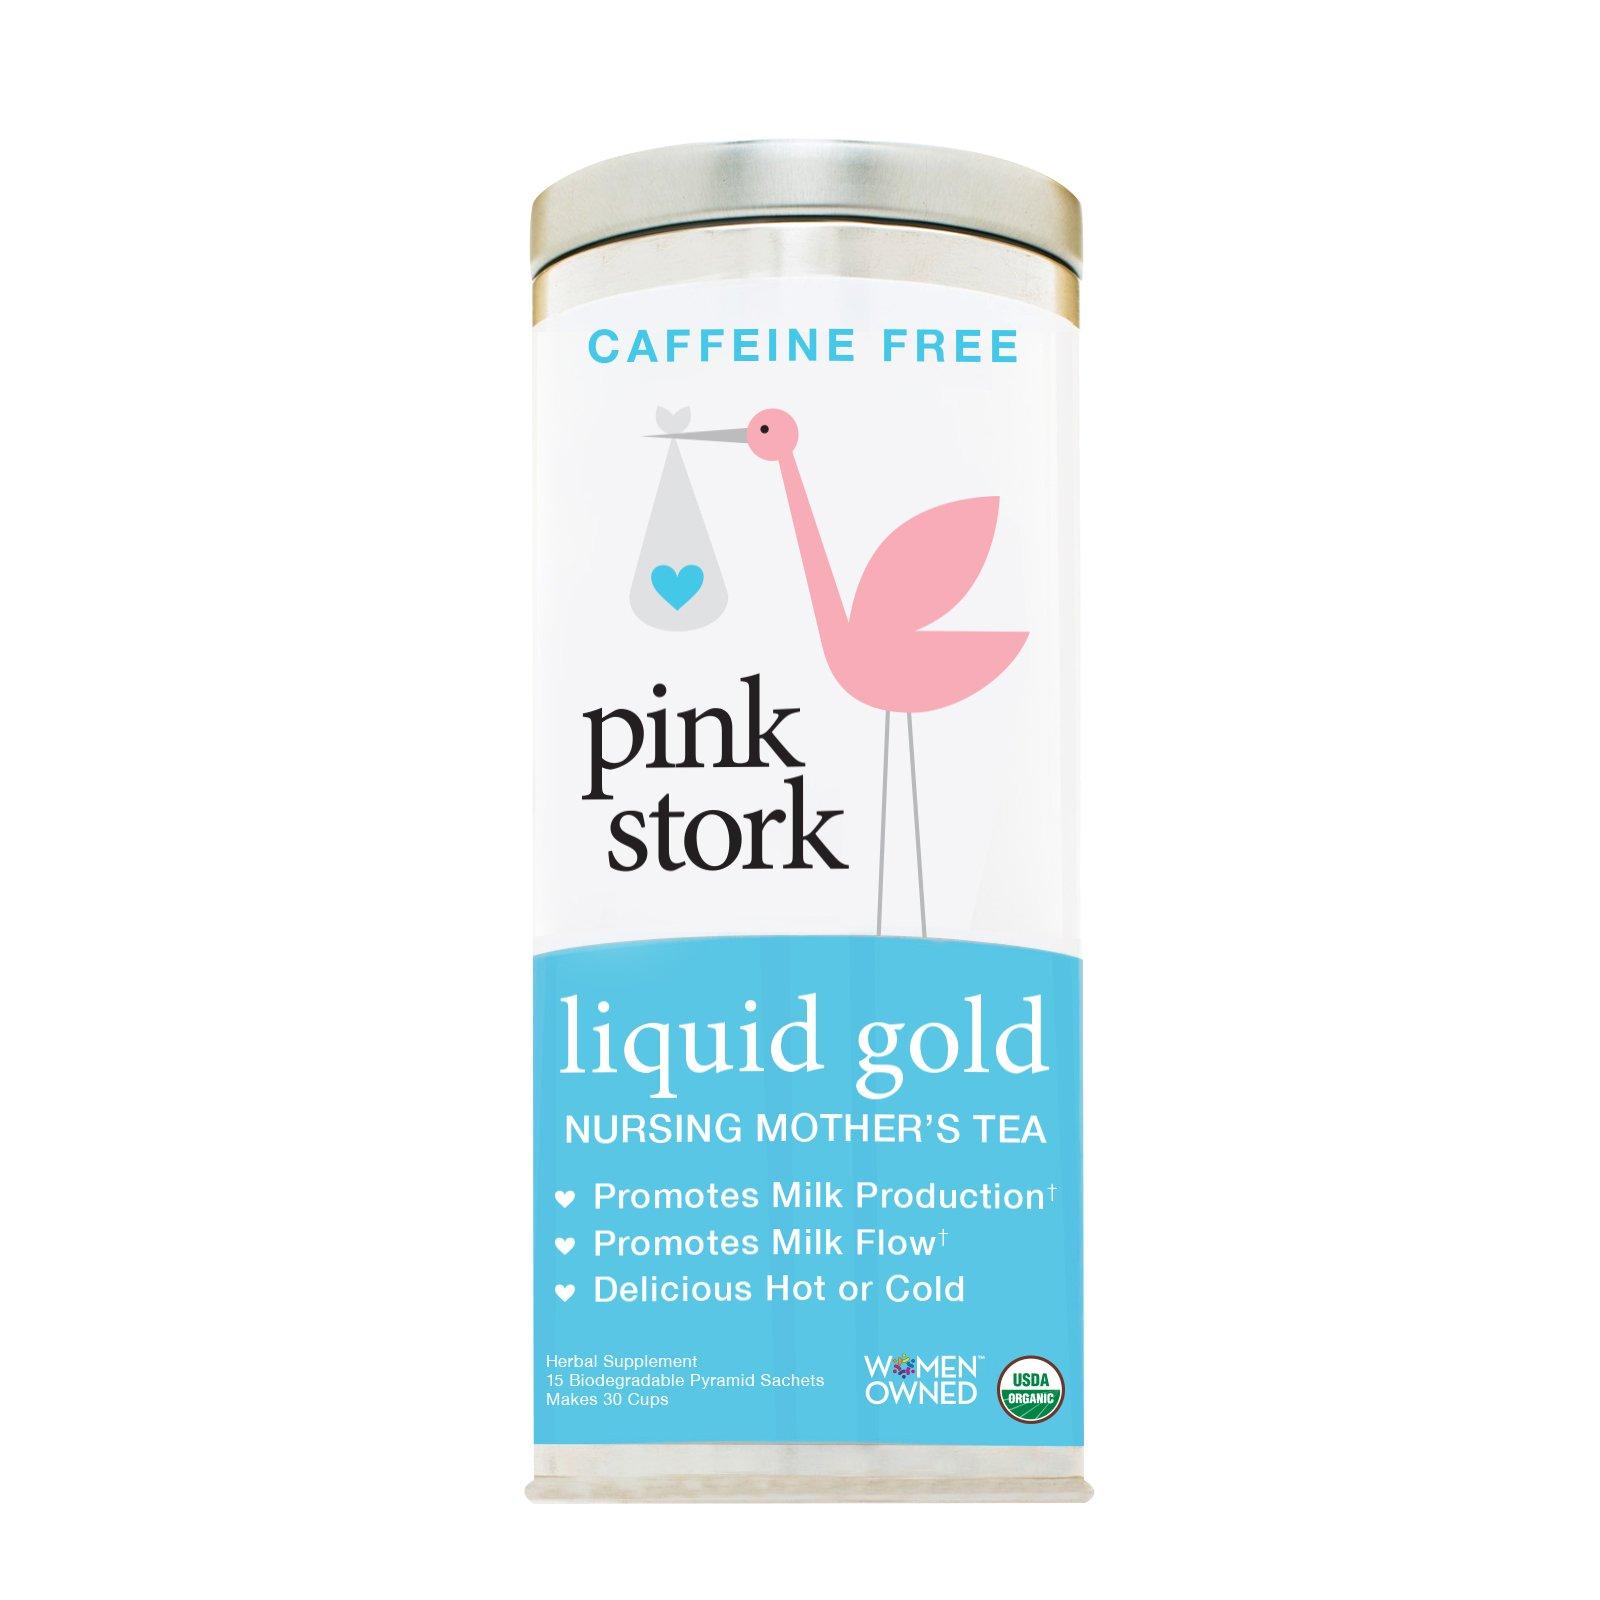 Pink Stork Liquid Gold: Breastfeeding and Lactation Support Tea -Organic Loose Leaf Tea in Biodegradable Sachets -Natural Lactation Support -Nursing Mother's Tea -Enhance Breastmilk Nutrition, Supply